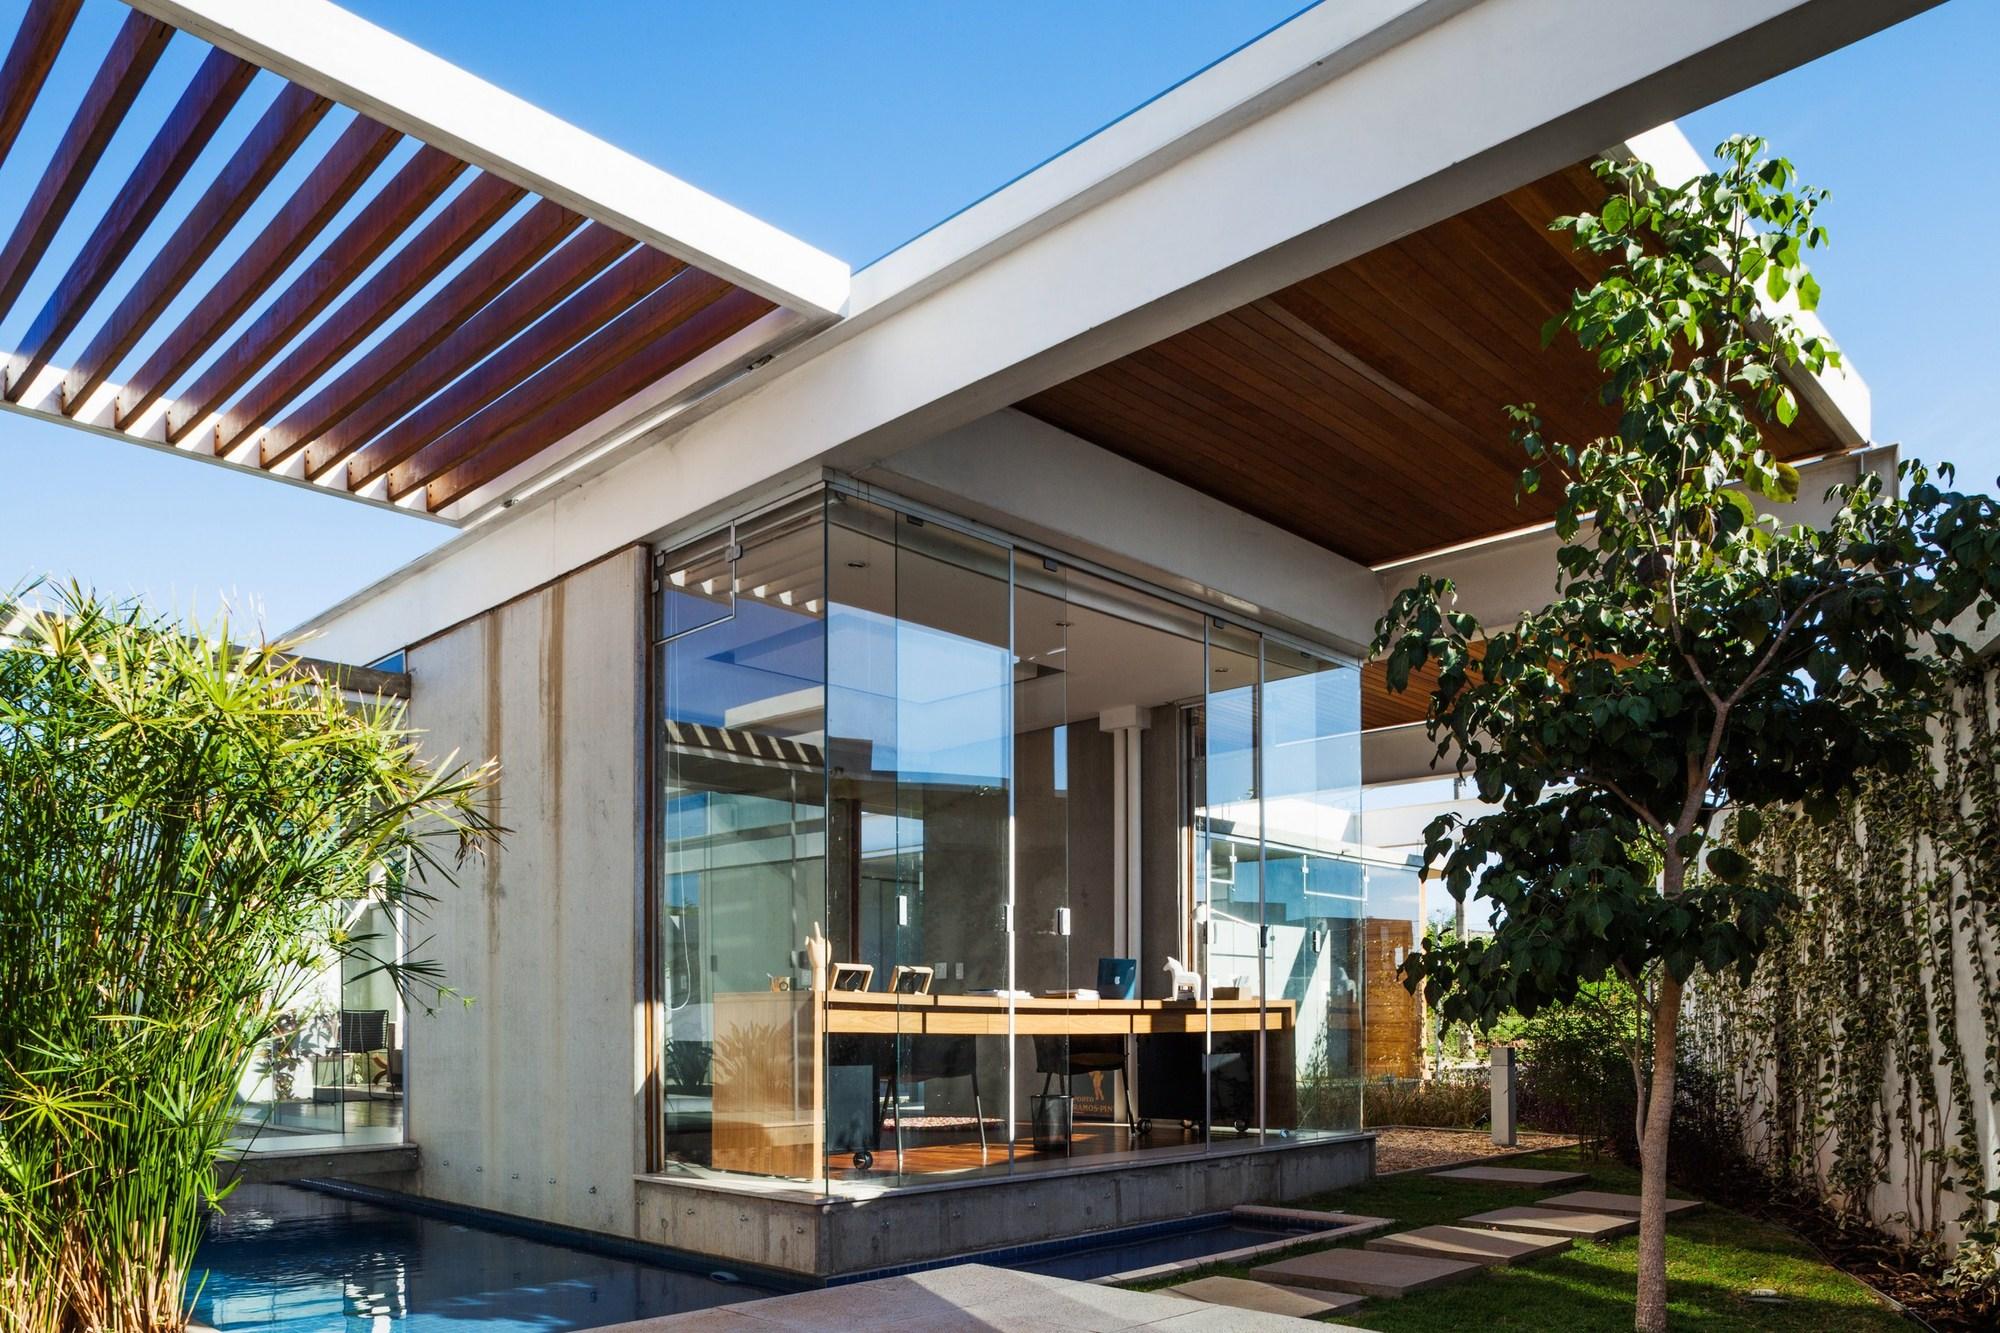 Sliding pergolas house fgmf arquitetos archdaily - Pergolas minimalistas ...